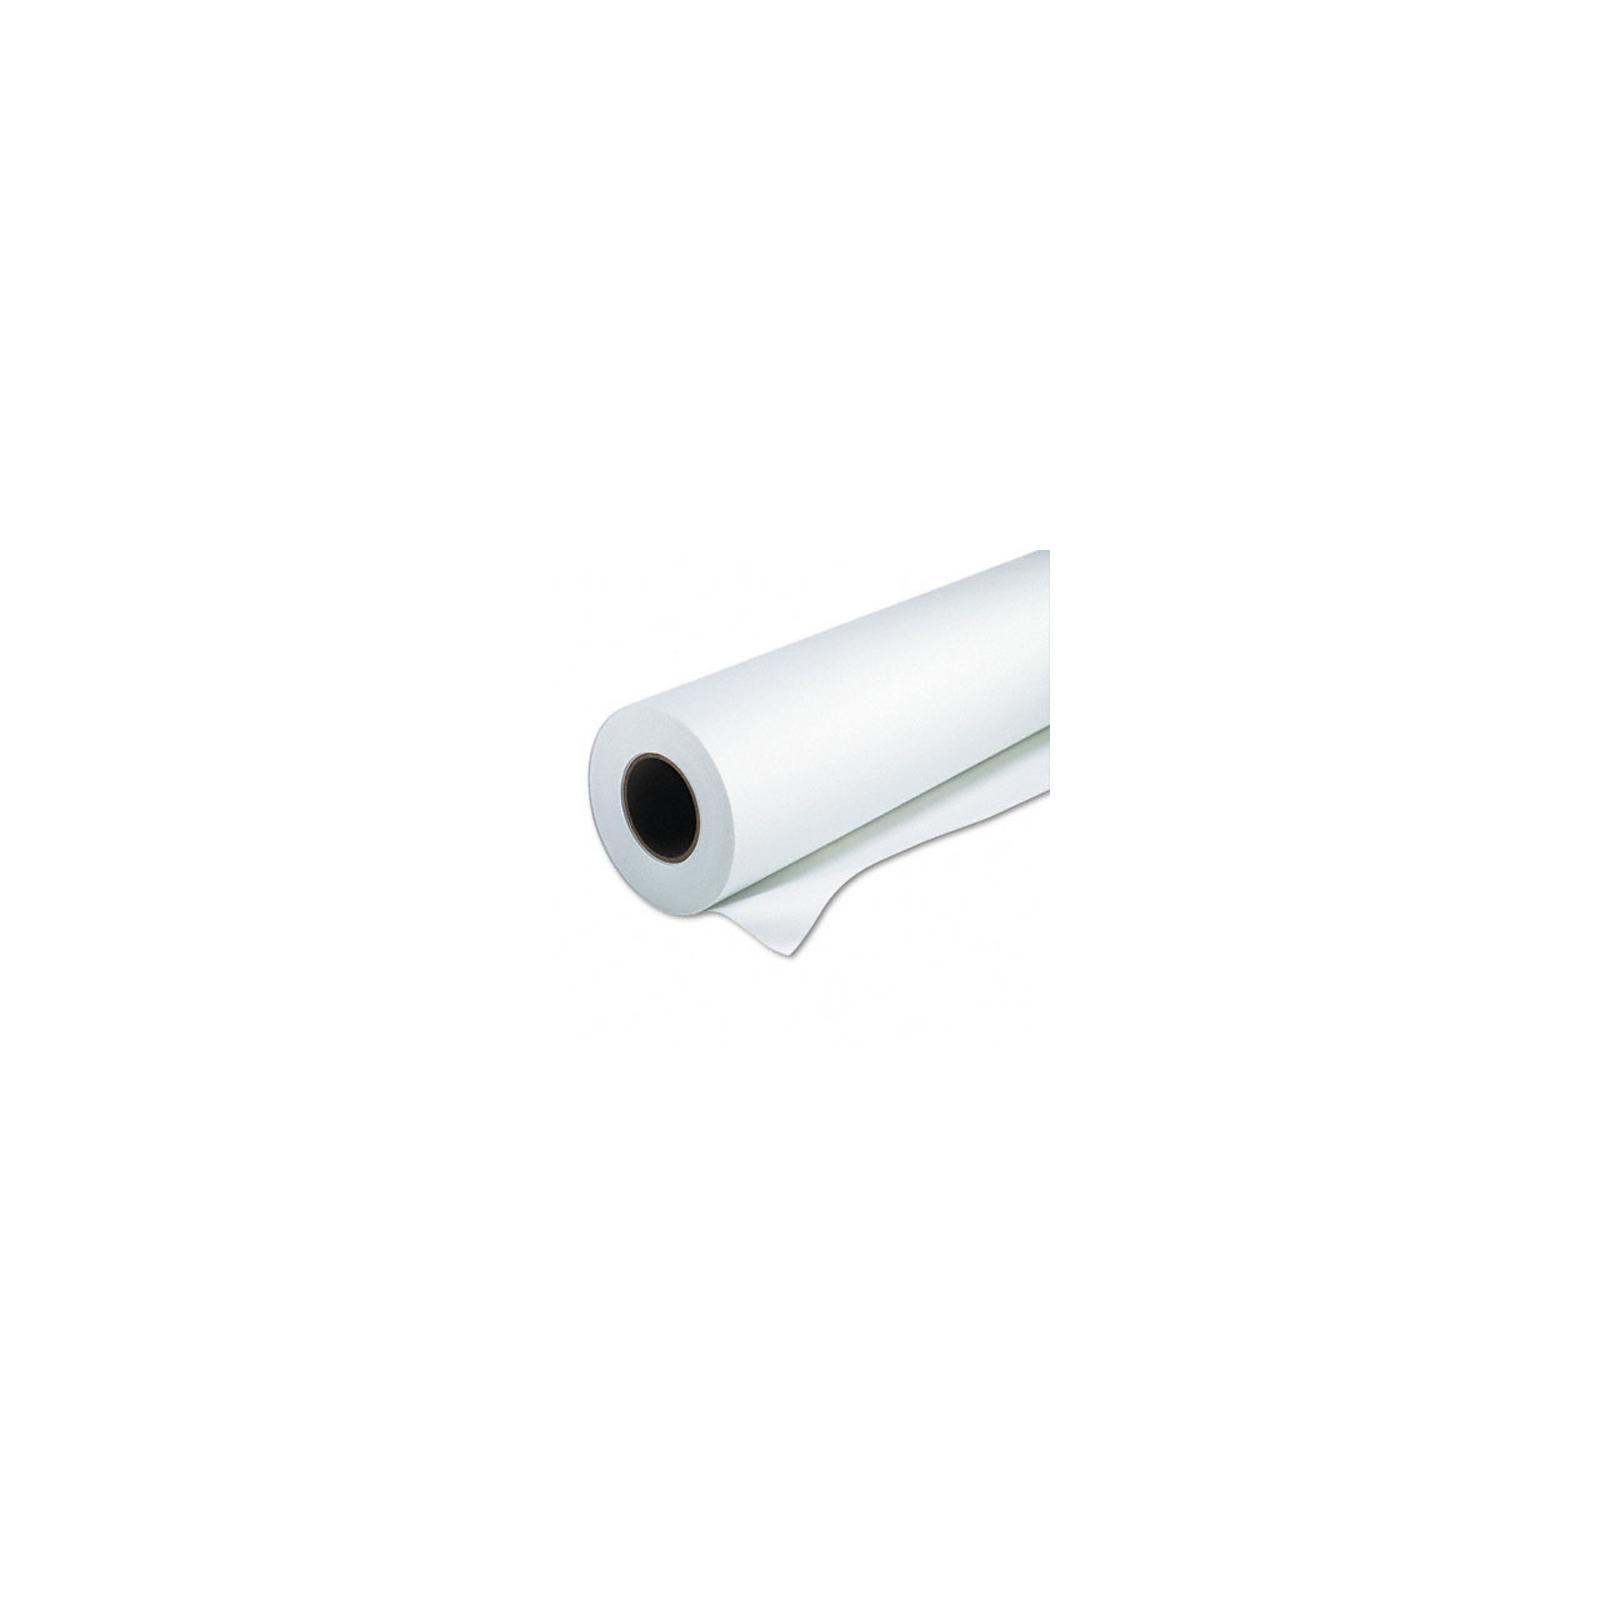 Бумага XEROX 420мм Inkjet Monochrome Paper (80) рулон 50 (496L94059)